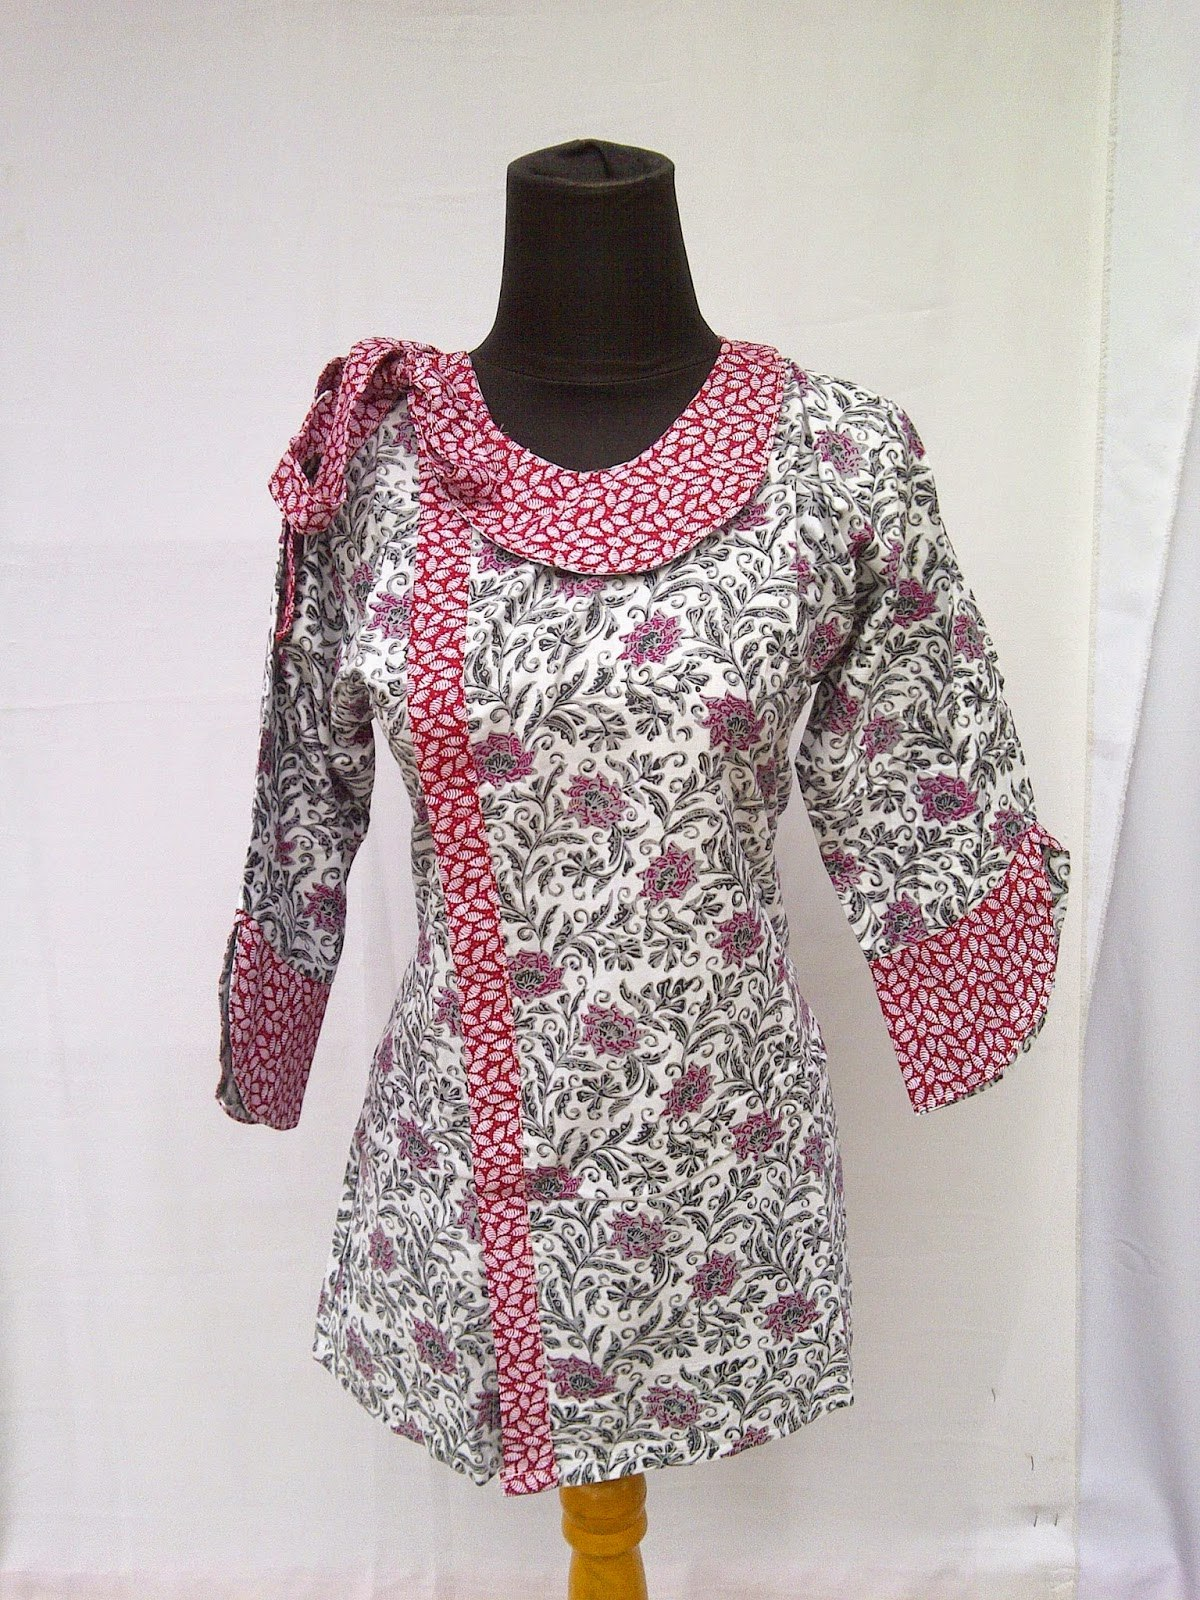 Ide Model Baju Lebaran atasan Etdg Model Baju Muslim atasan Wanita Trendy Terbaru